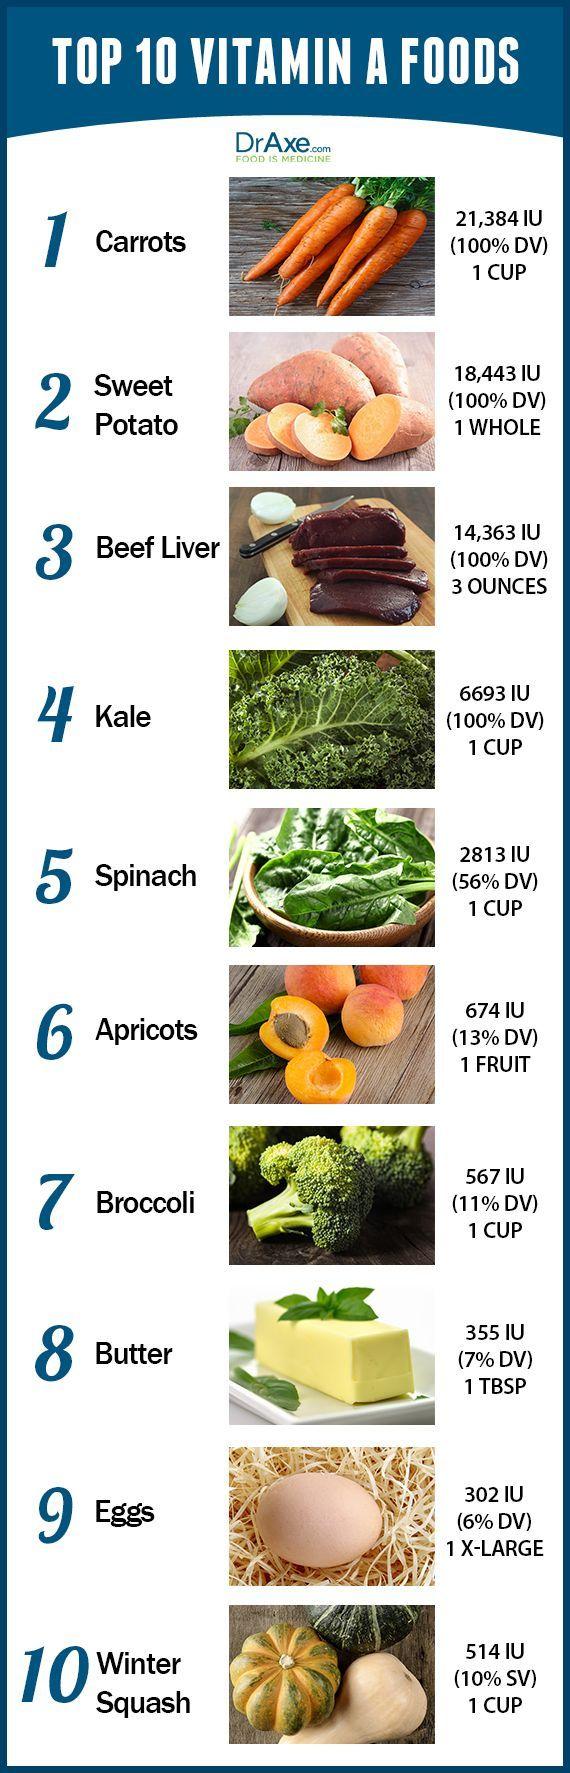 Top 10 Vitamin A Foods List http://www.draxe.com #health #holistic #natural